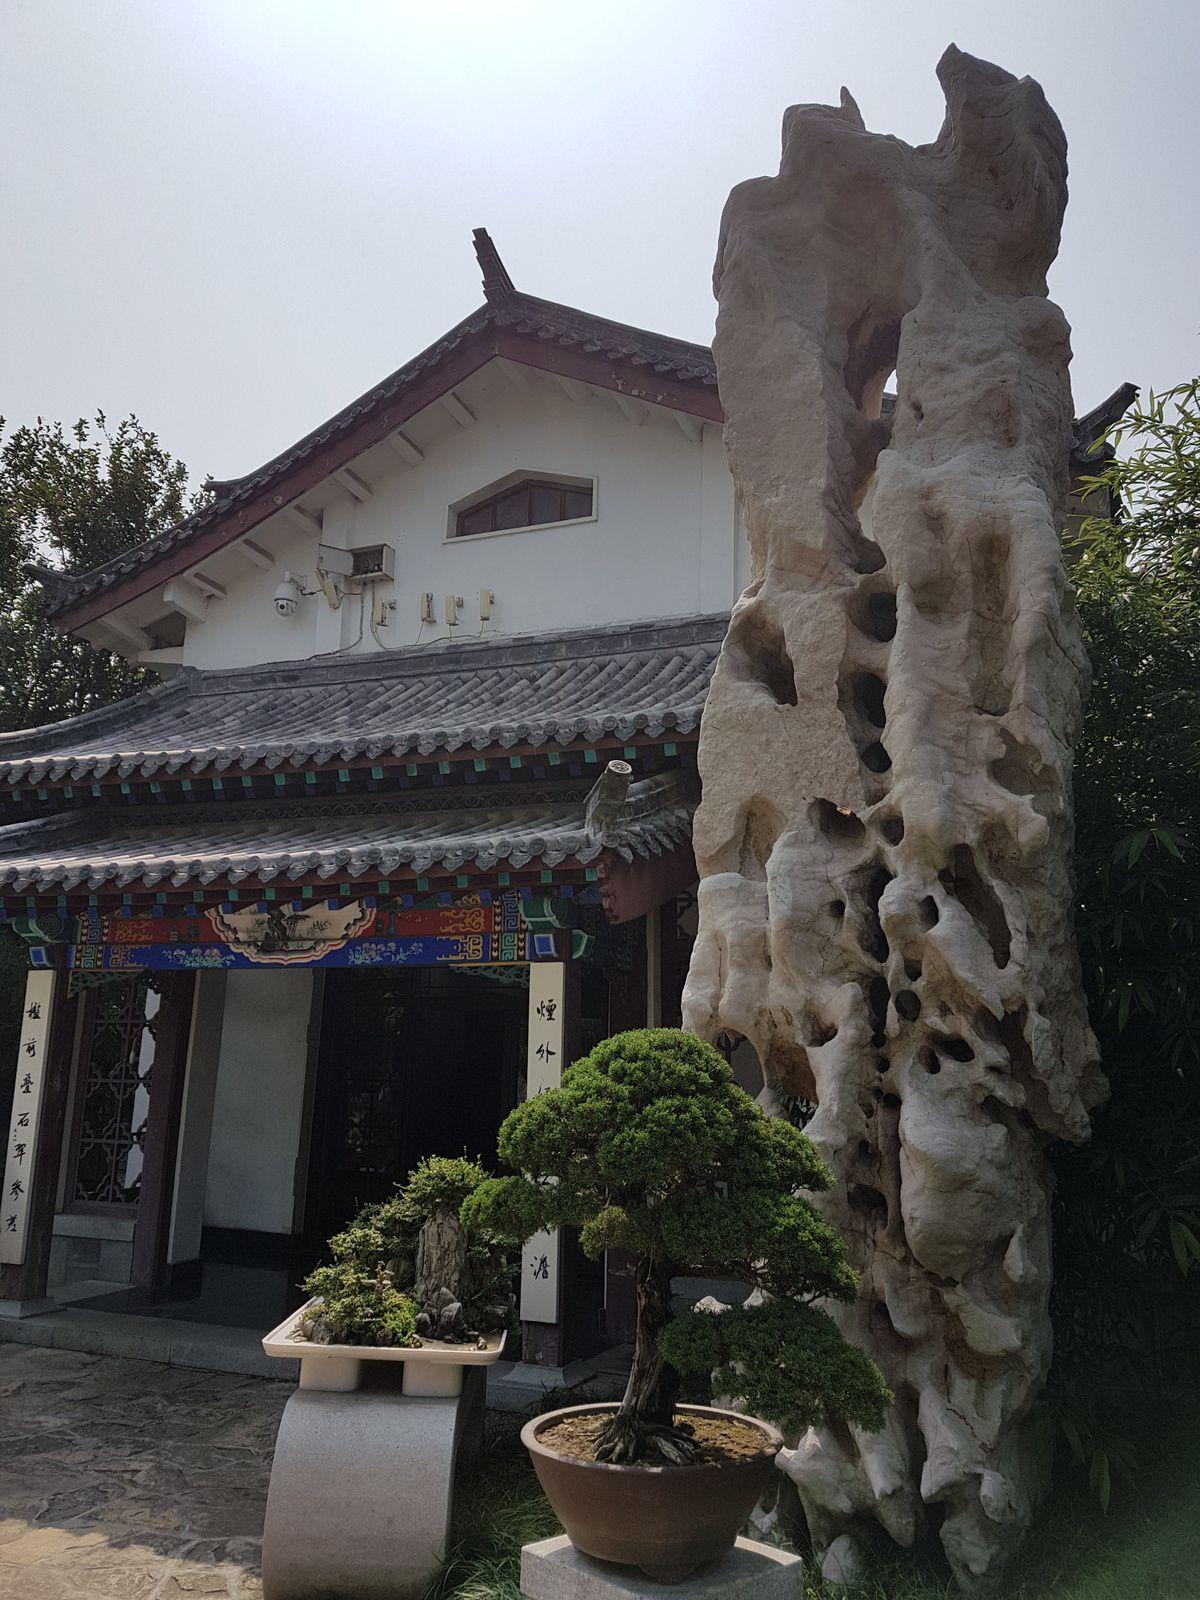 Jinan, capitale du Shandong, en Chine, avec son Lac Daming et sa Source Daotu.